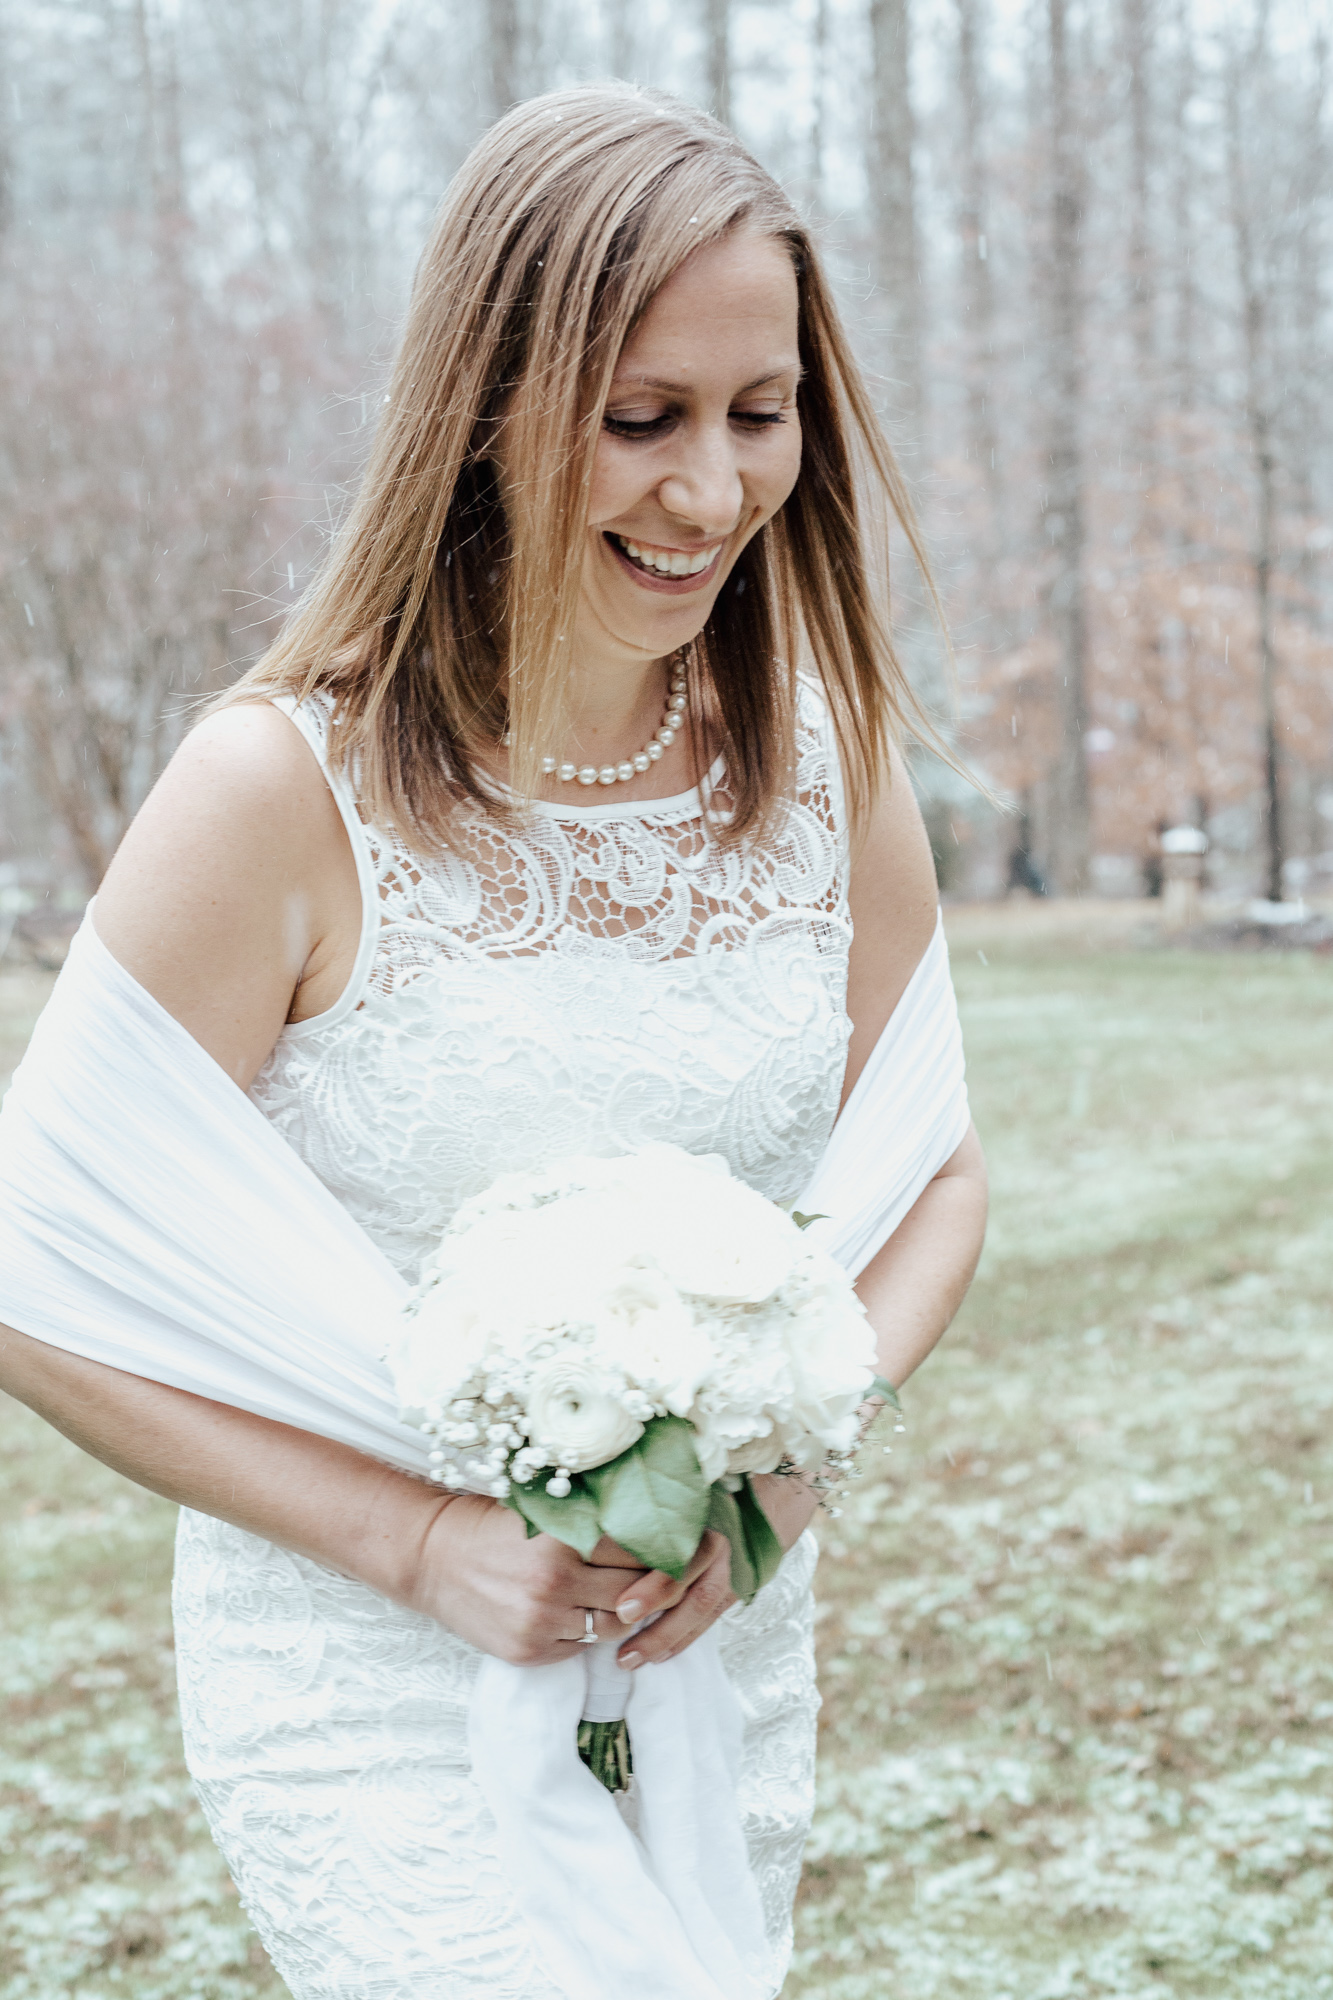 Jason & Katie | Married-037.jpg